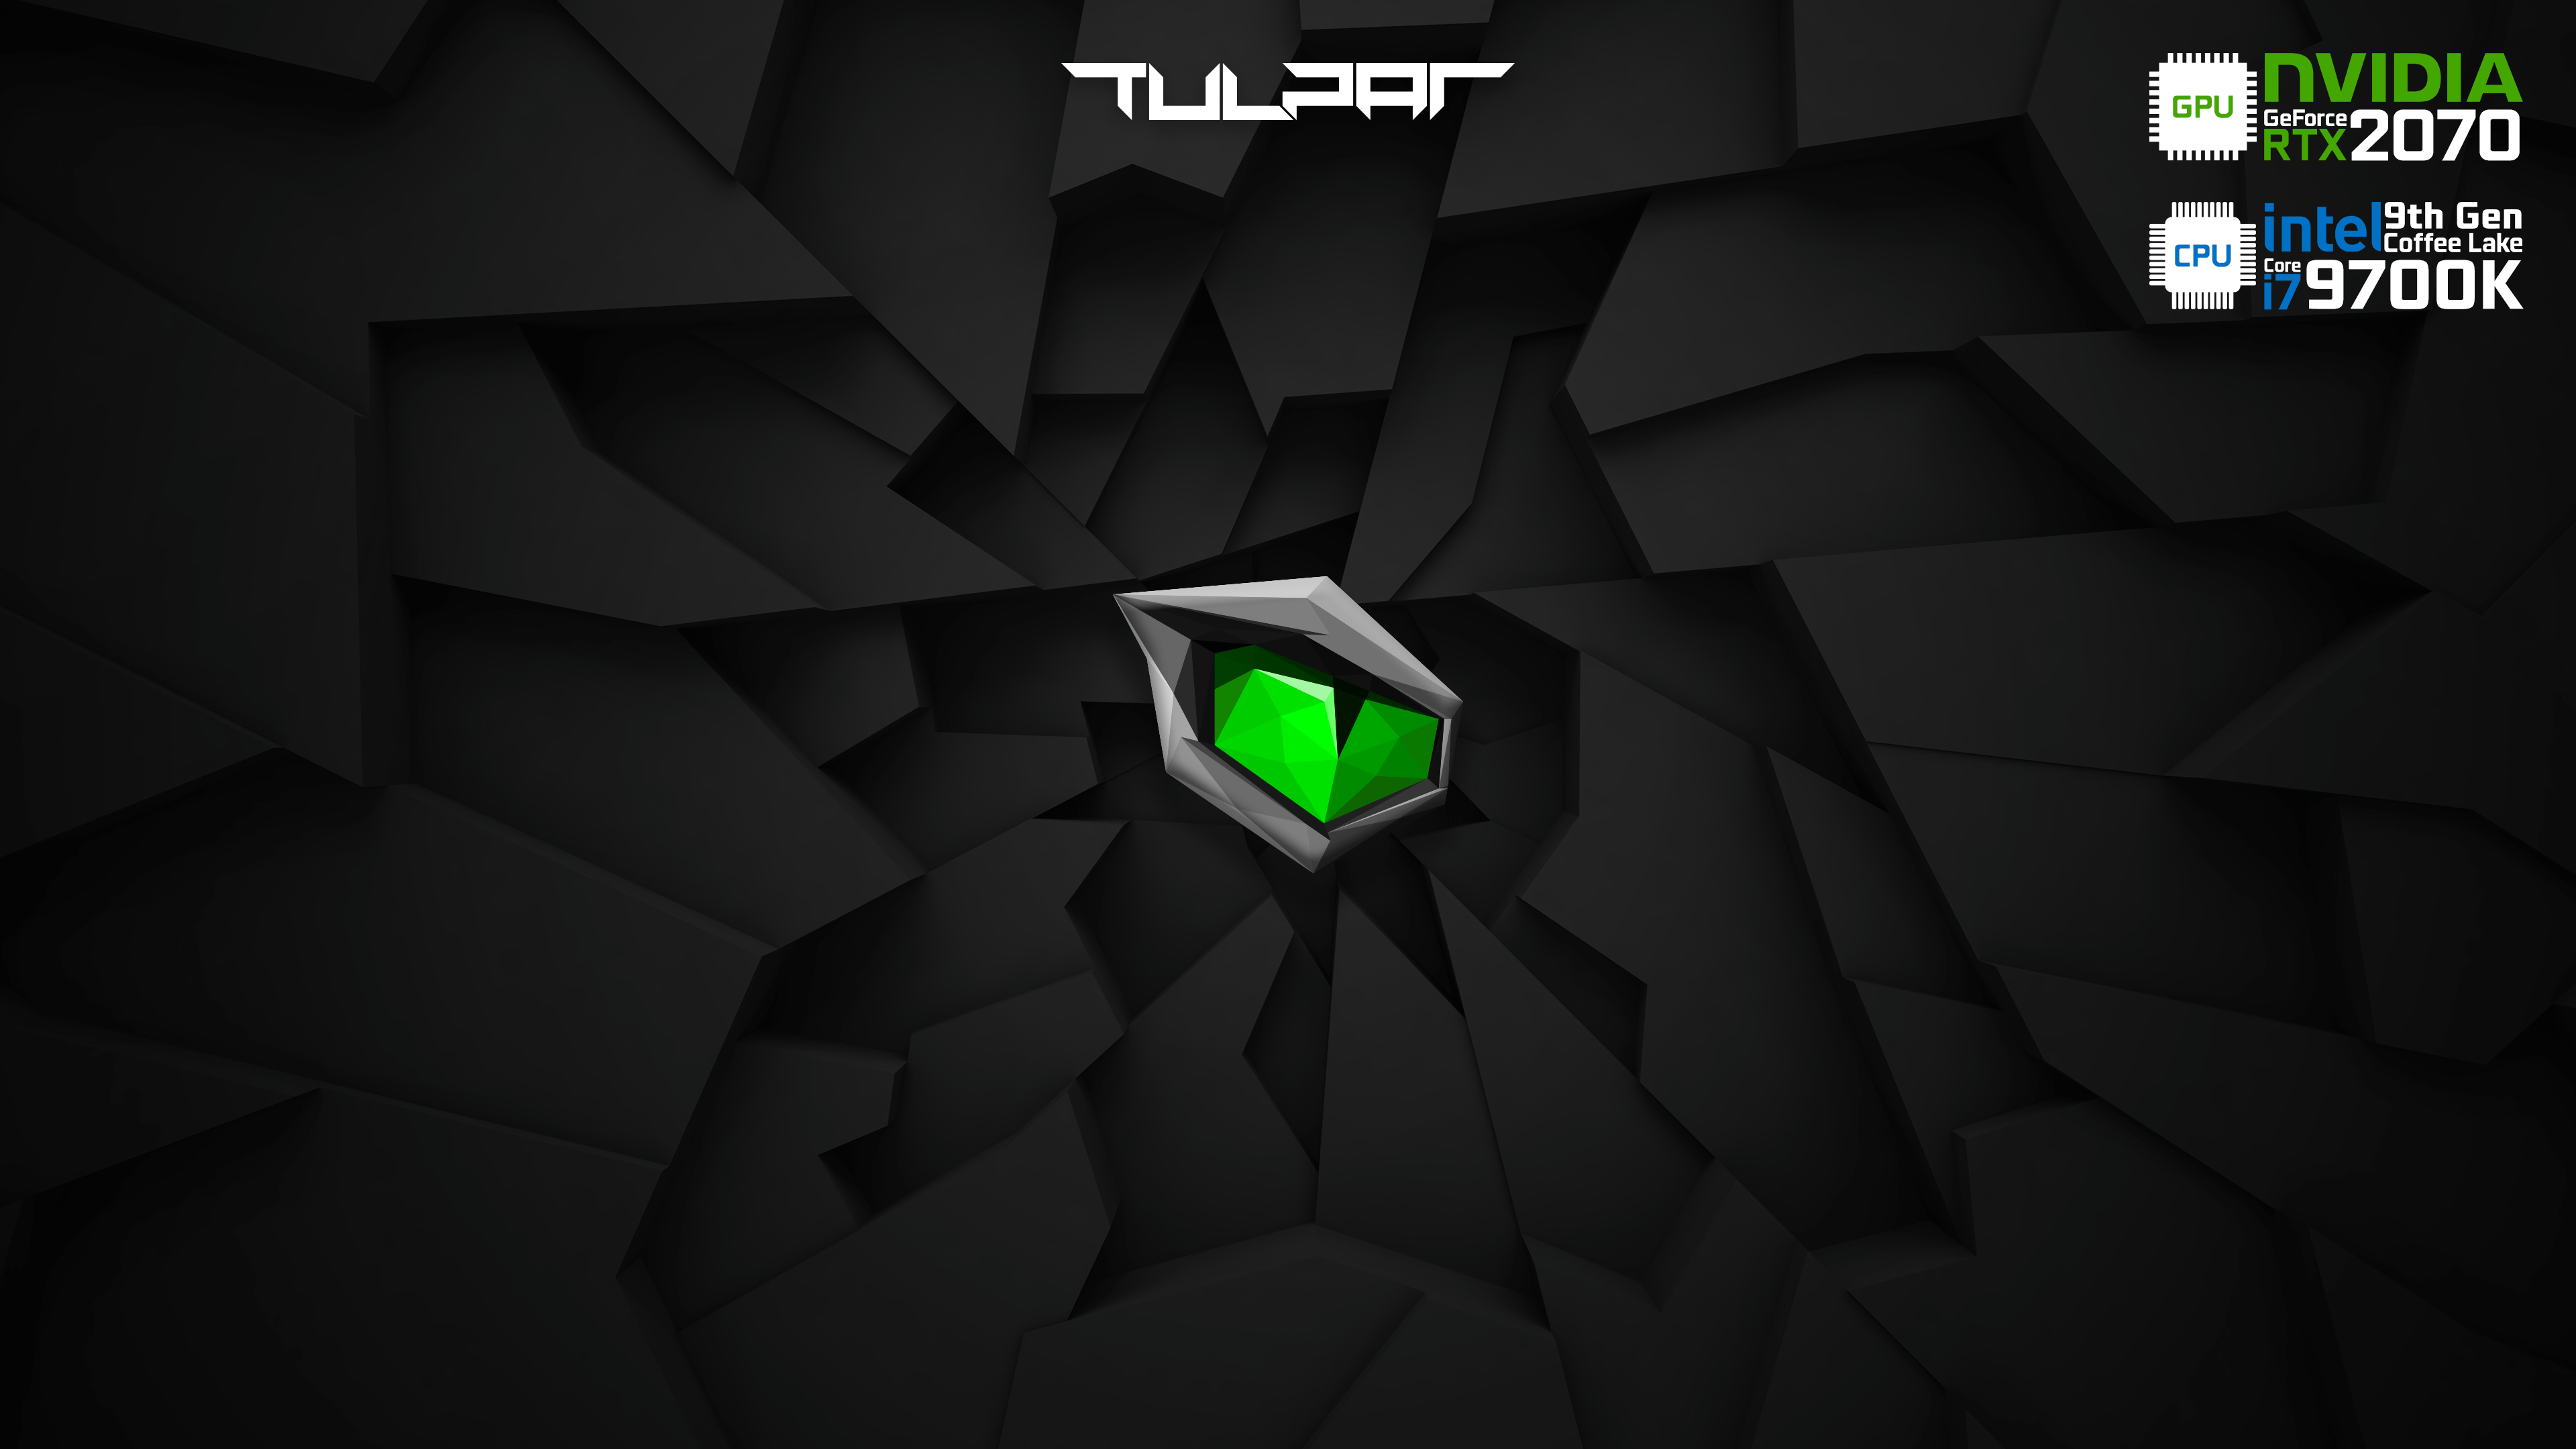 Monster - Tulpar - RTX 2070 - i7 9700K